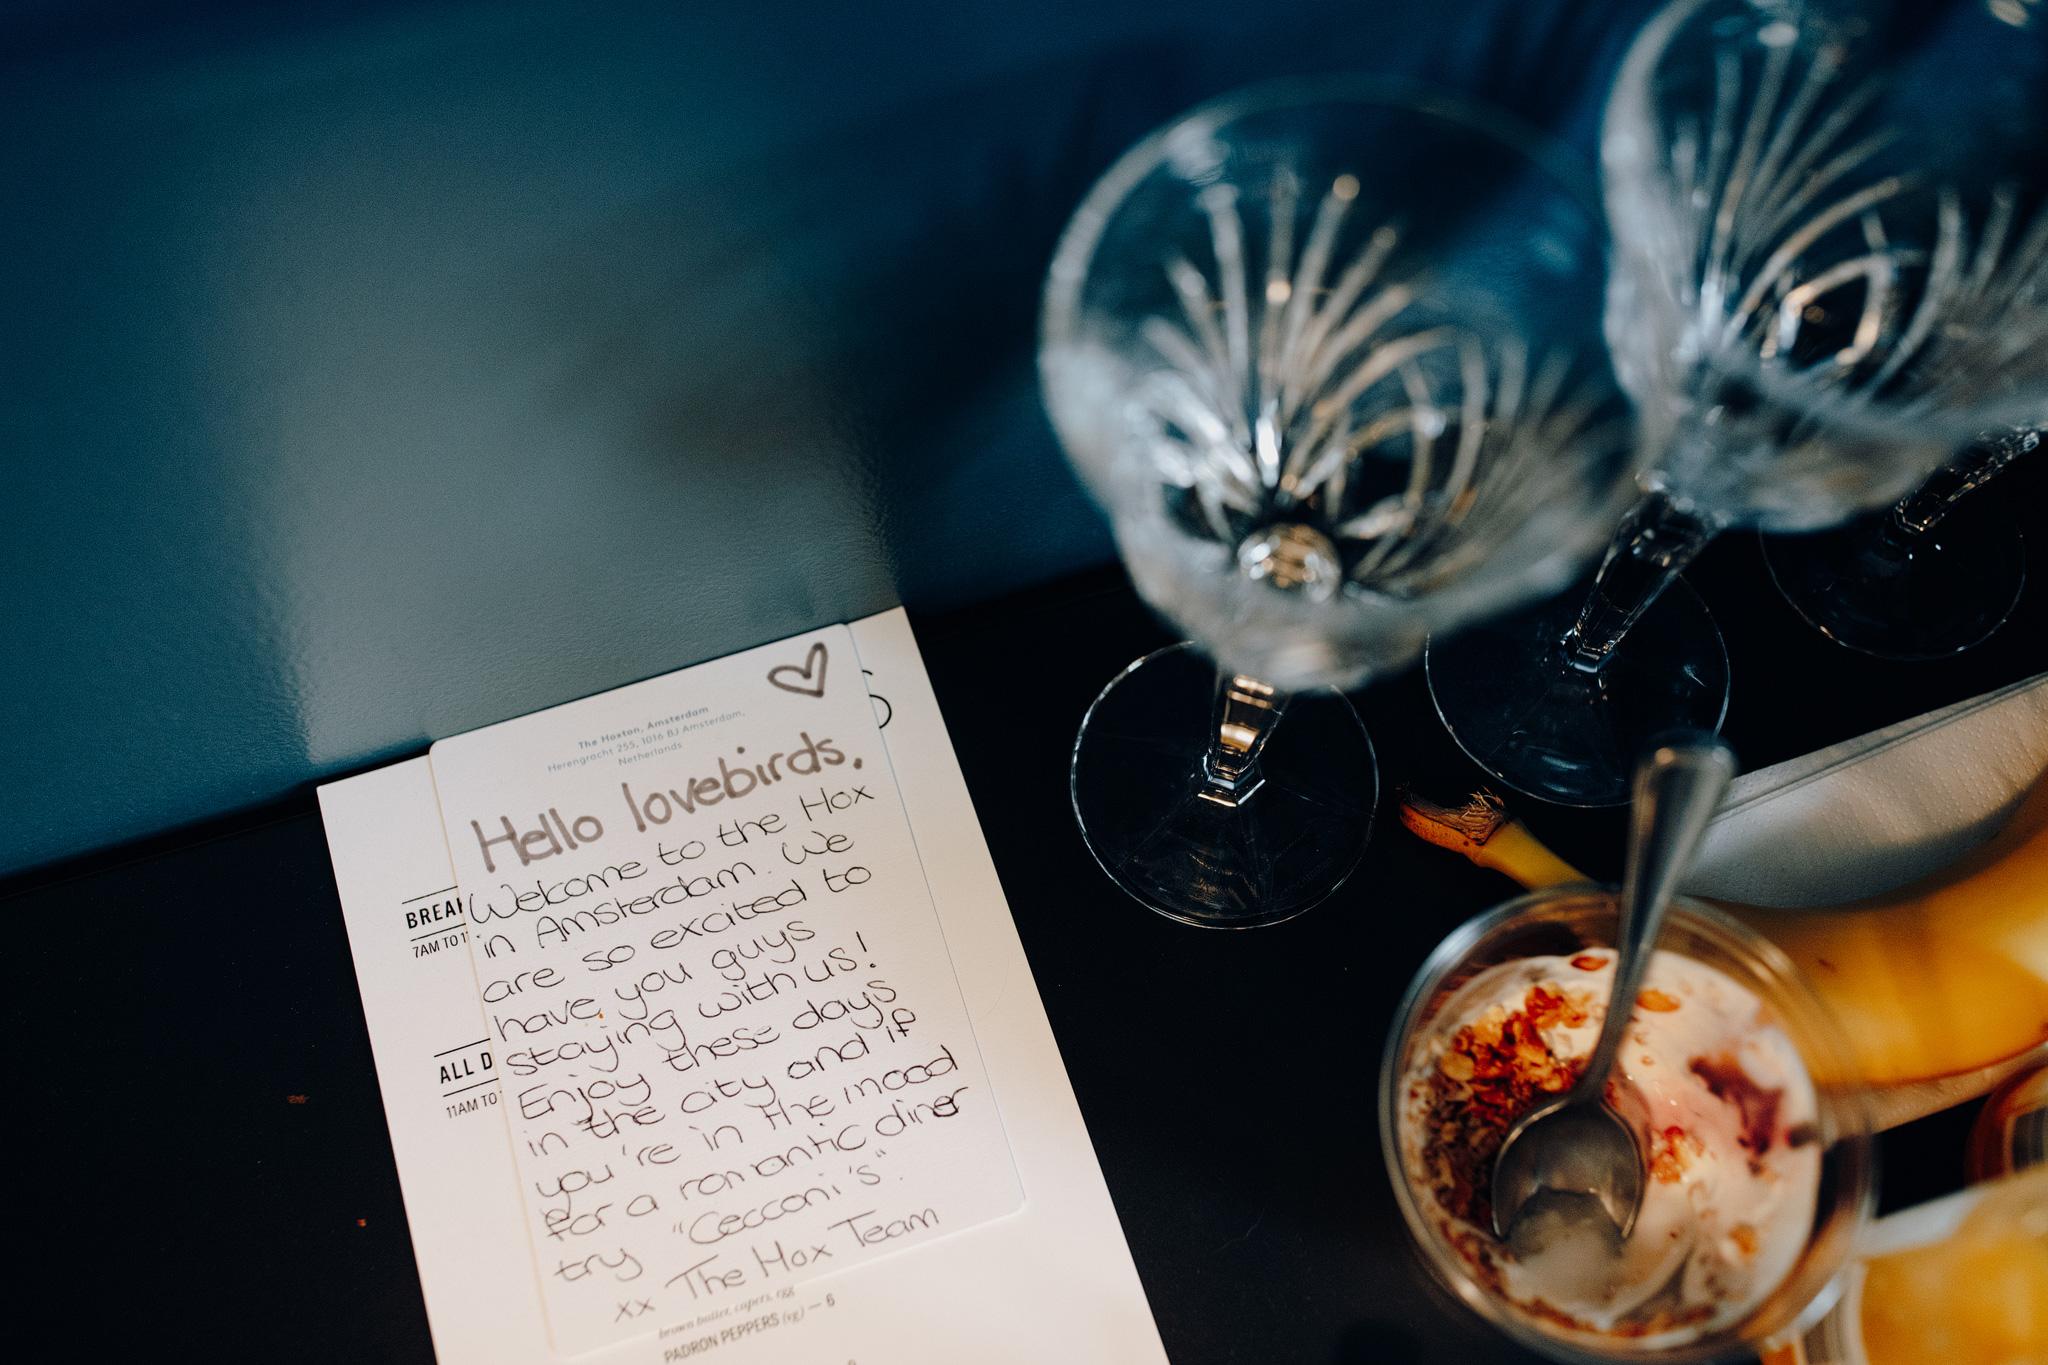 Handwritten note to wedding couple